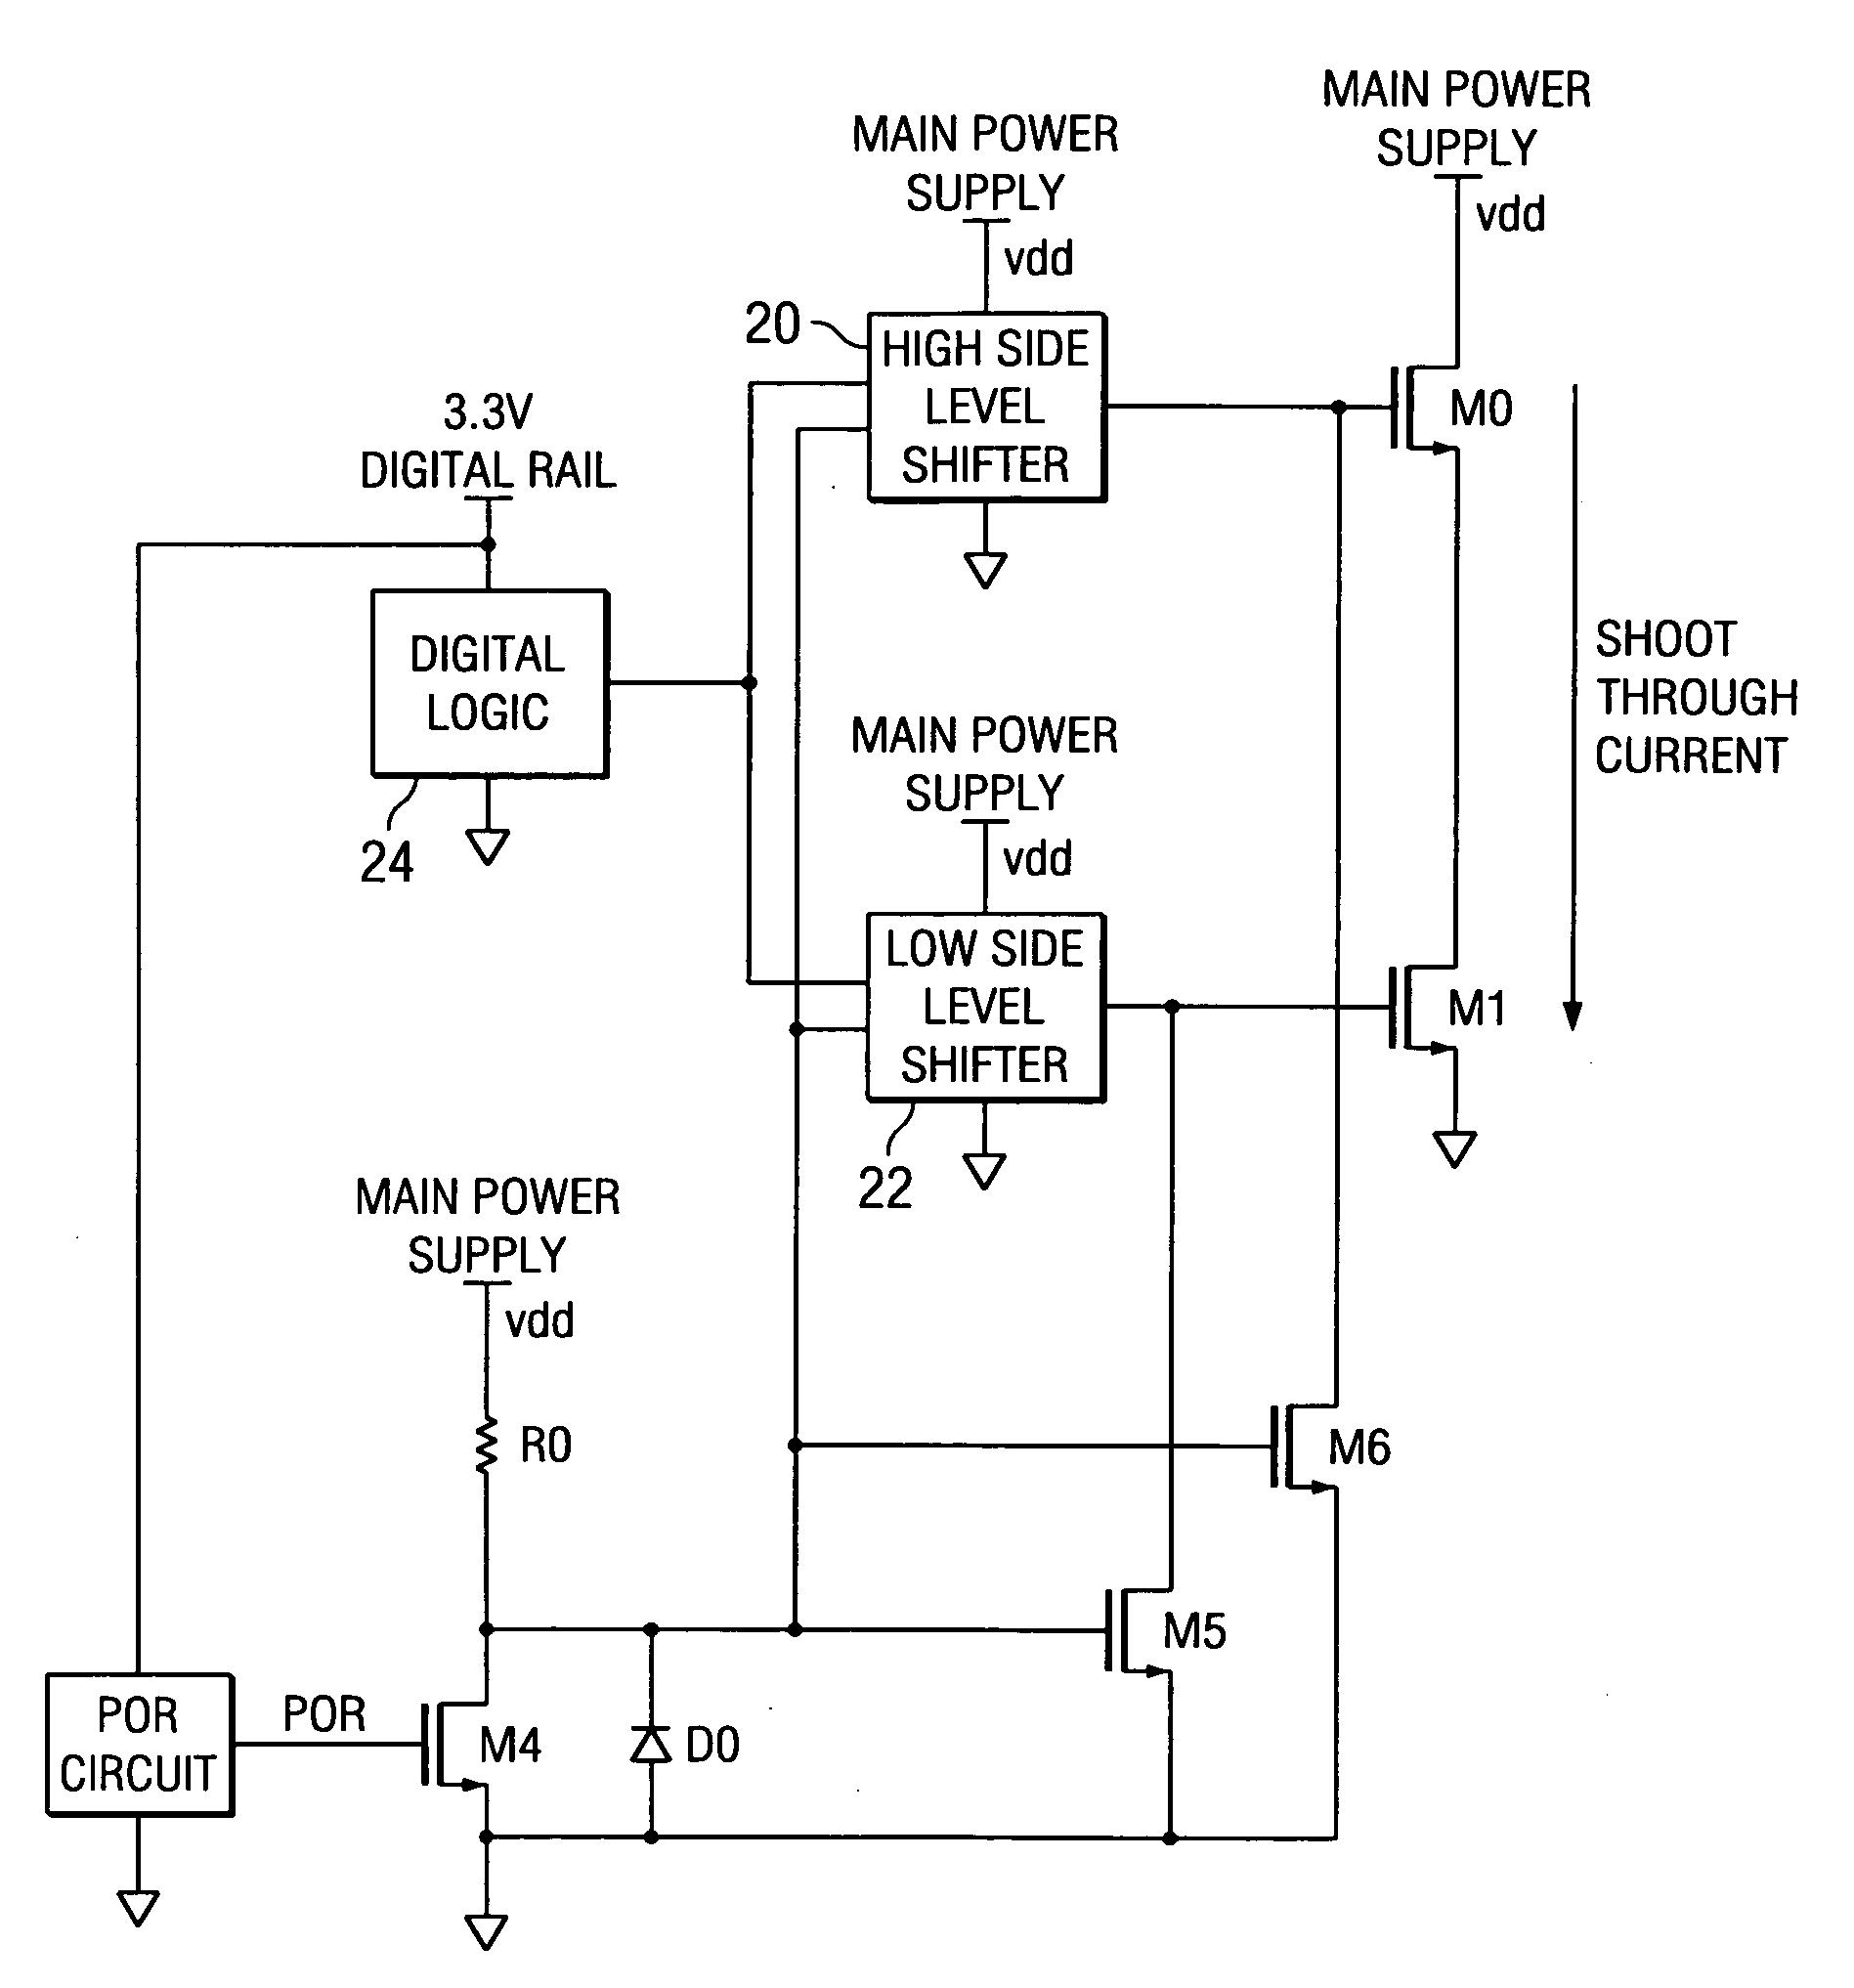 Brevet Us20070080708 H Bridge Circuit With Shoot Through Current Diagram Patent Drawing